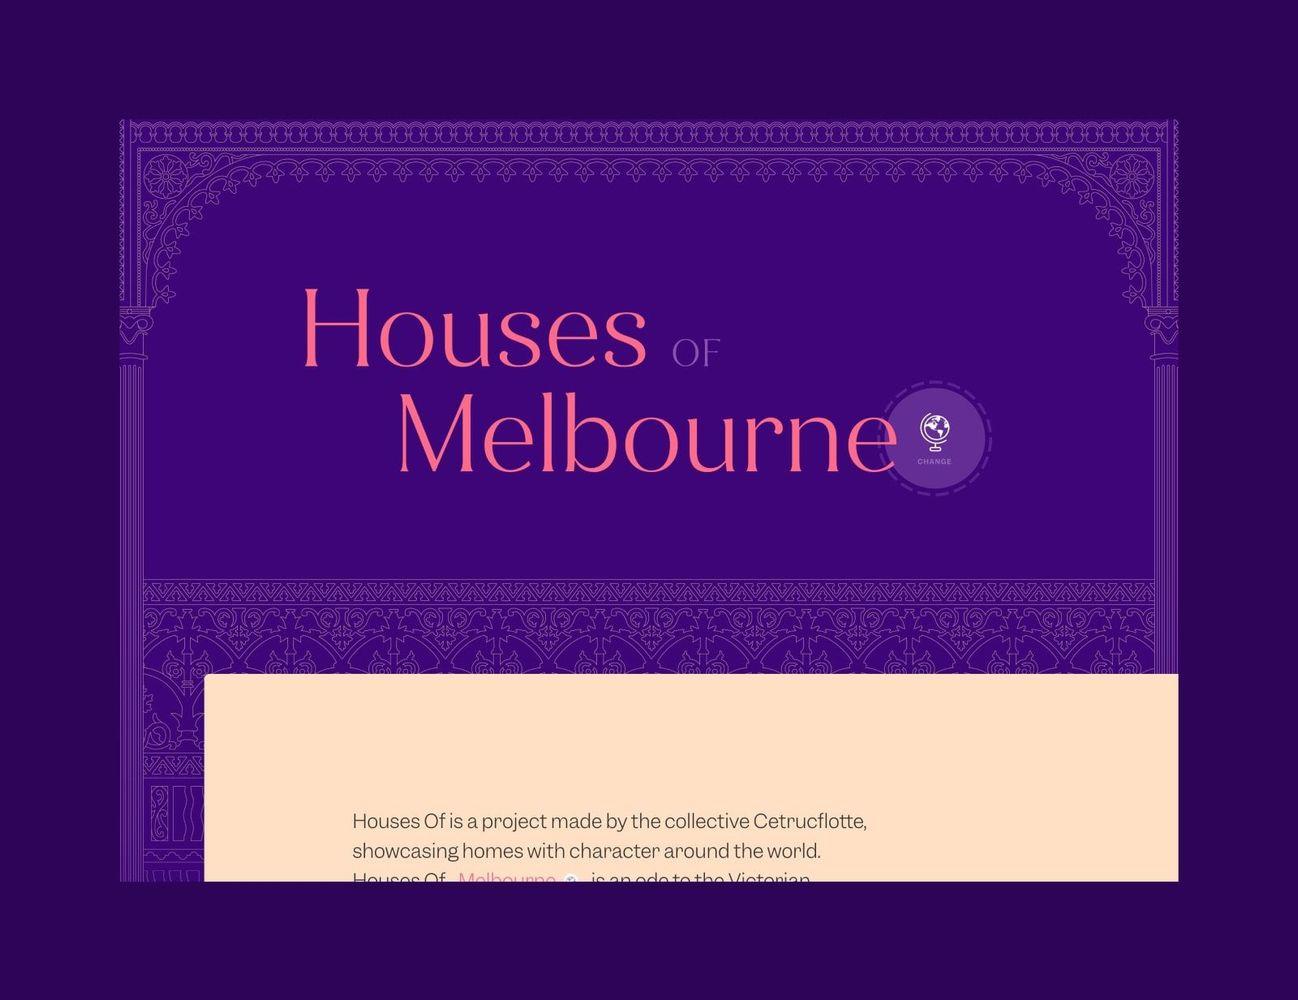 Housesof Place